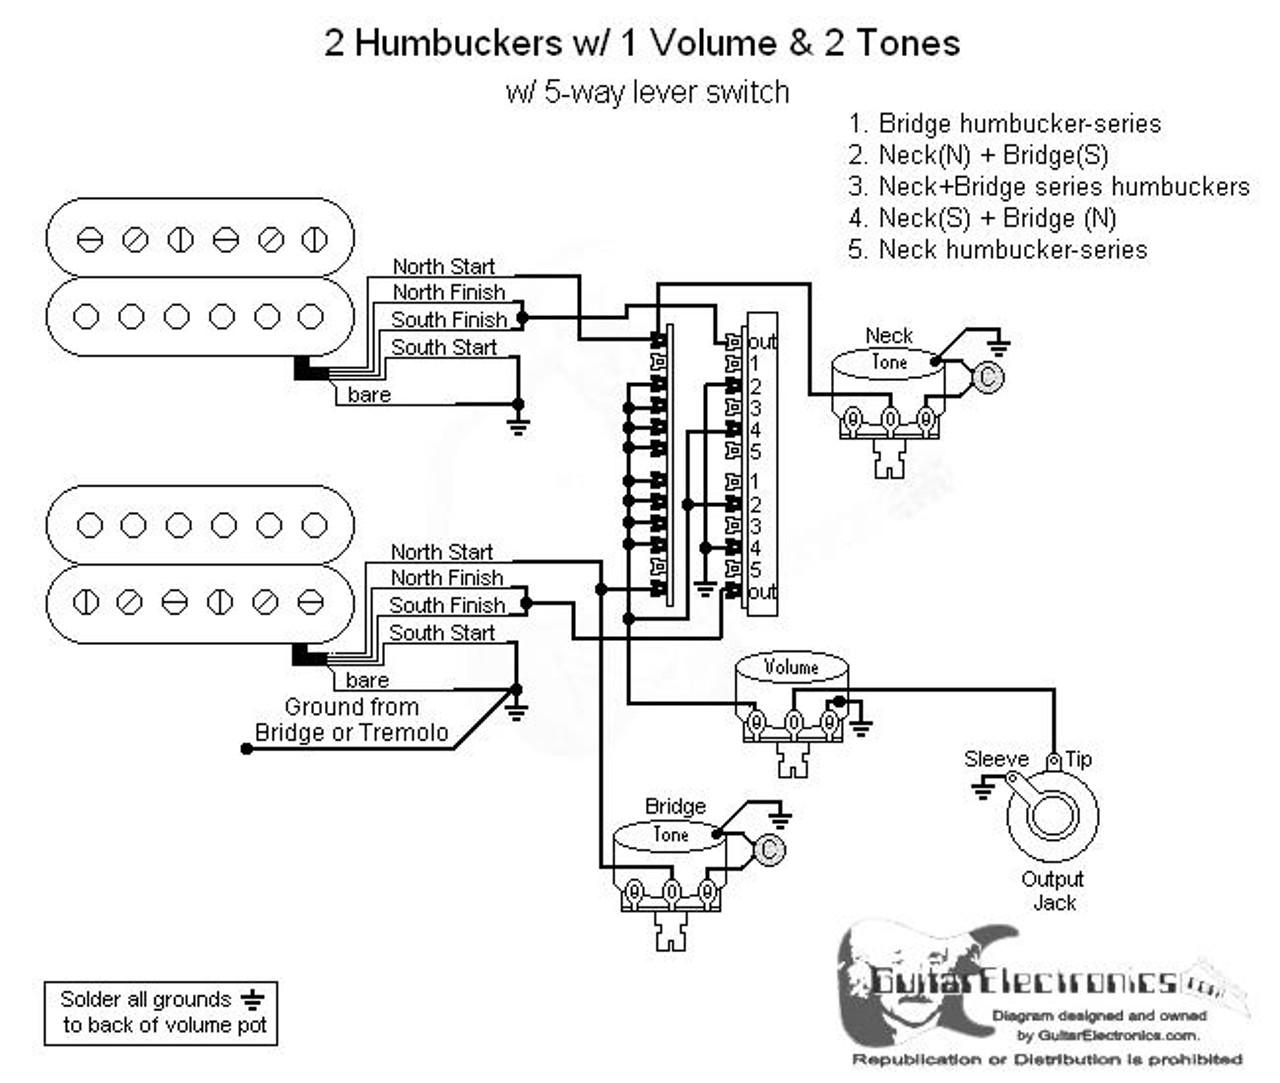 medium resolution of 2 humbuckers 5 way lever switch 1 volume 2 tones 05fender strat wiring diagram 2 humbucker